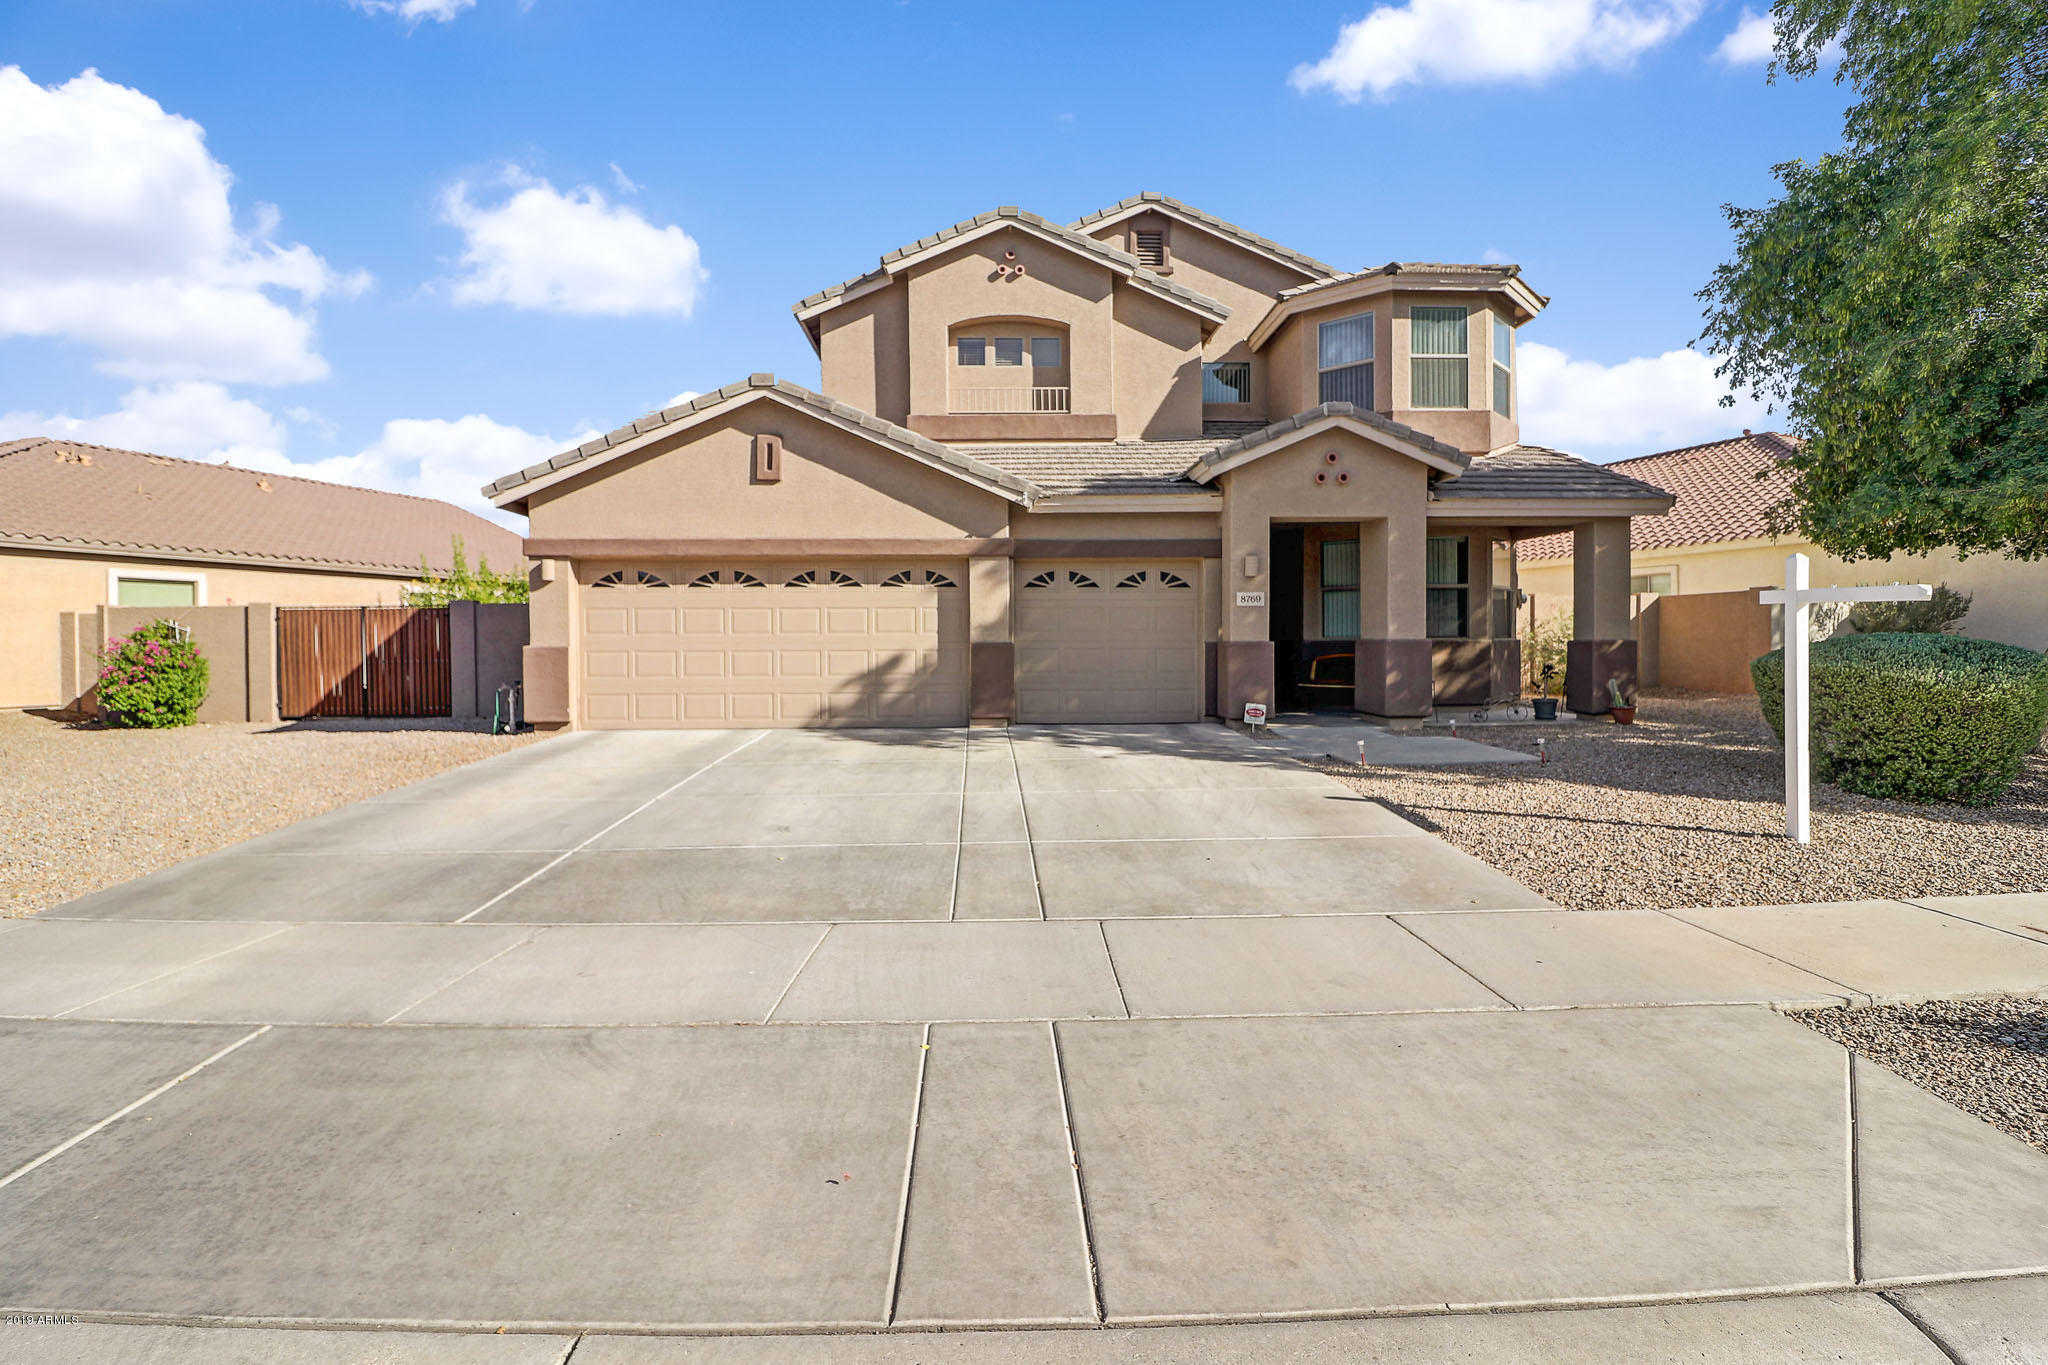 $348,000 - 5Br/3Ba - Home for Sale in Rovey Farm Estates, Glendale